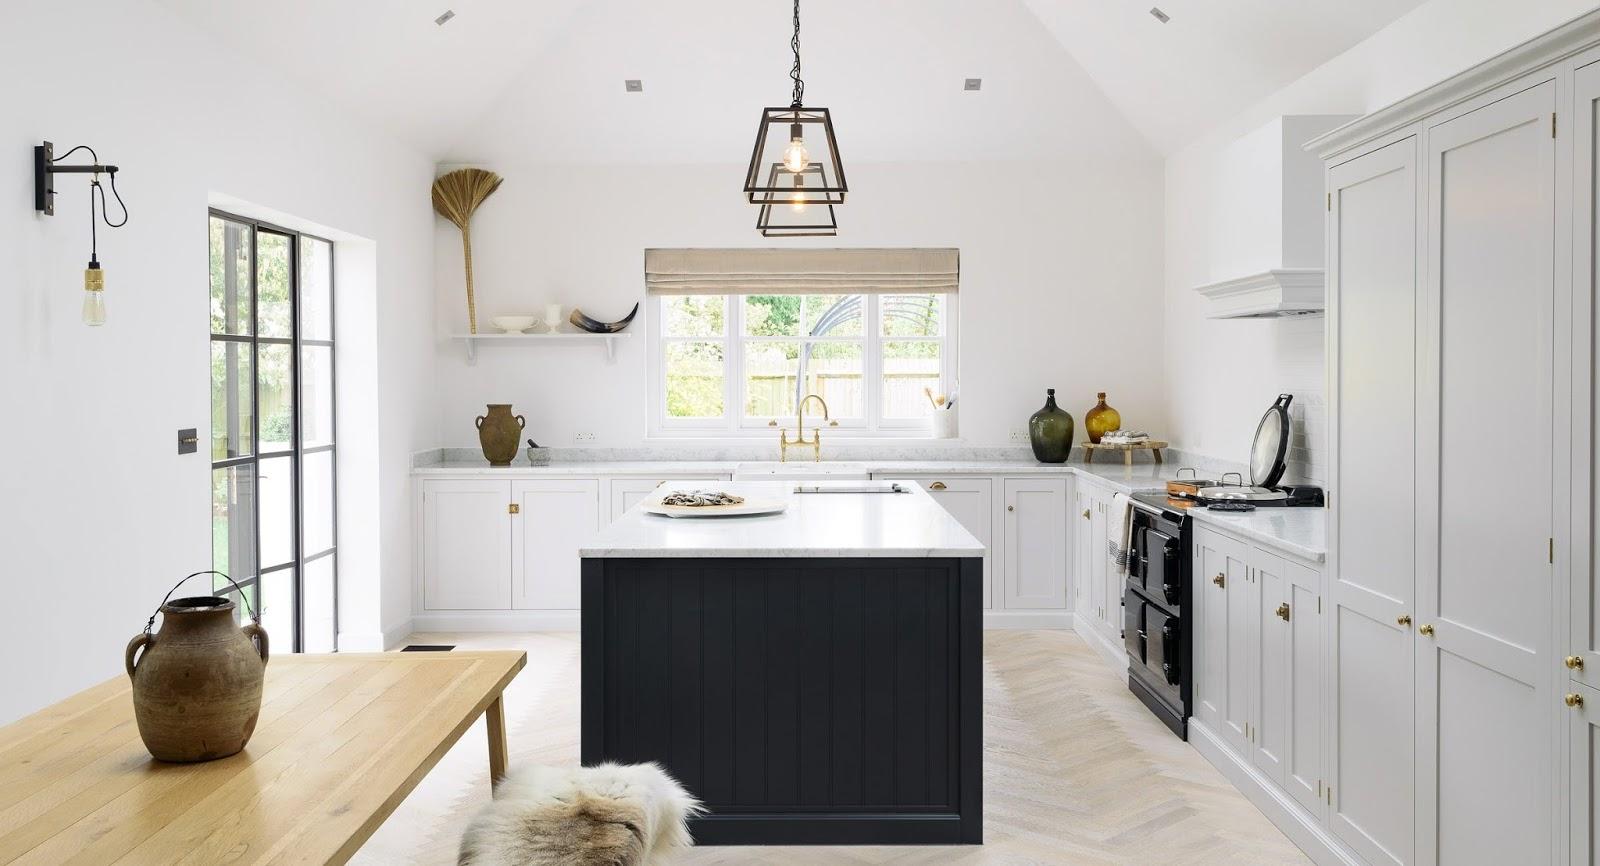 Lofty Modern Farmhouse Kitchen With Shaker Cabinets